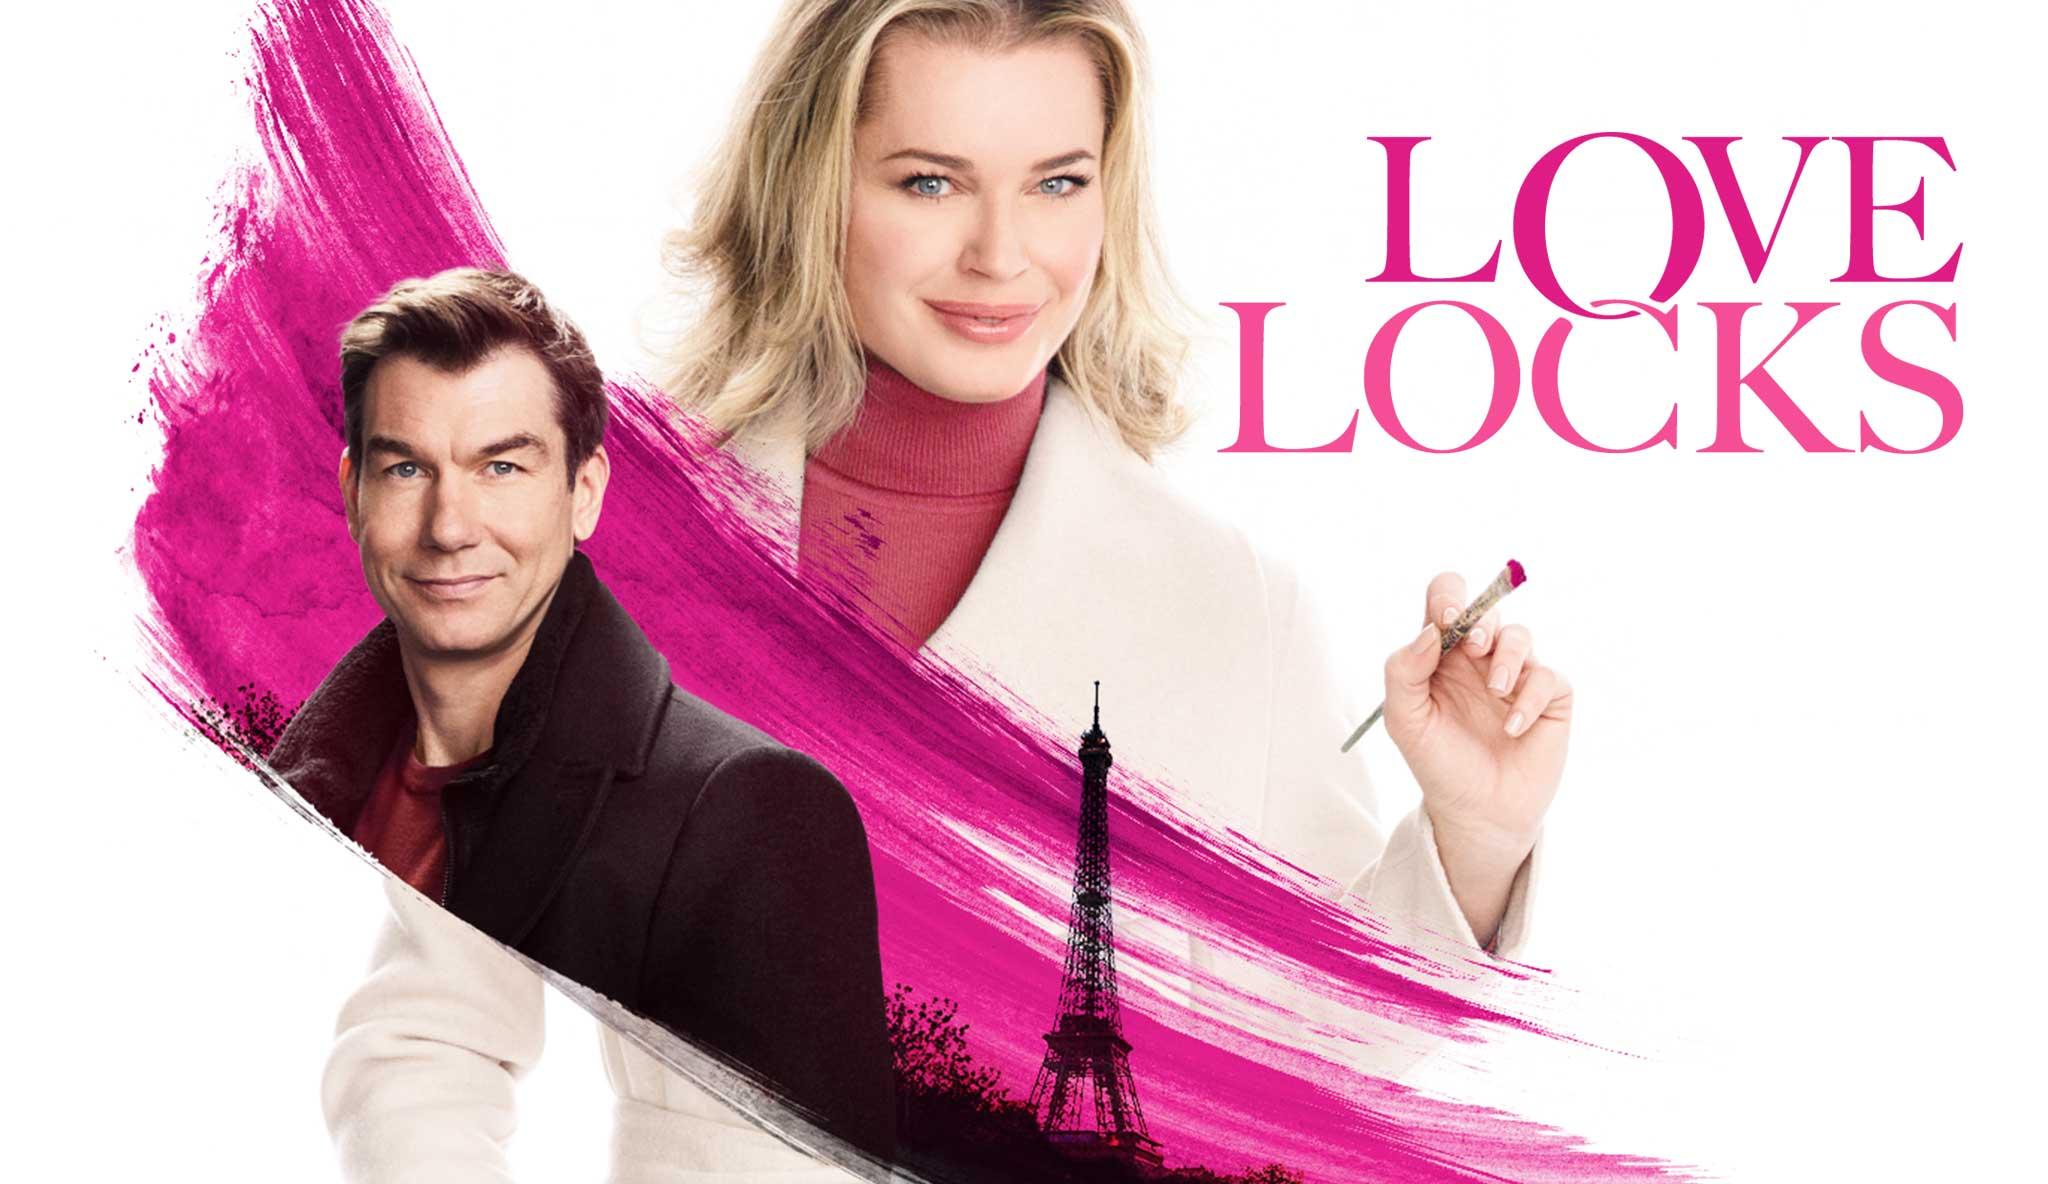 love-locks\header.jpg